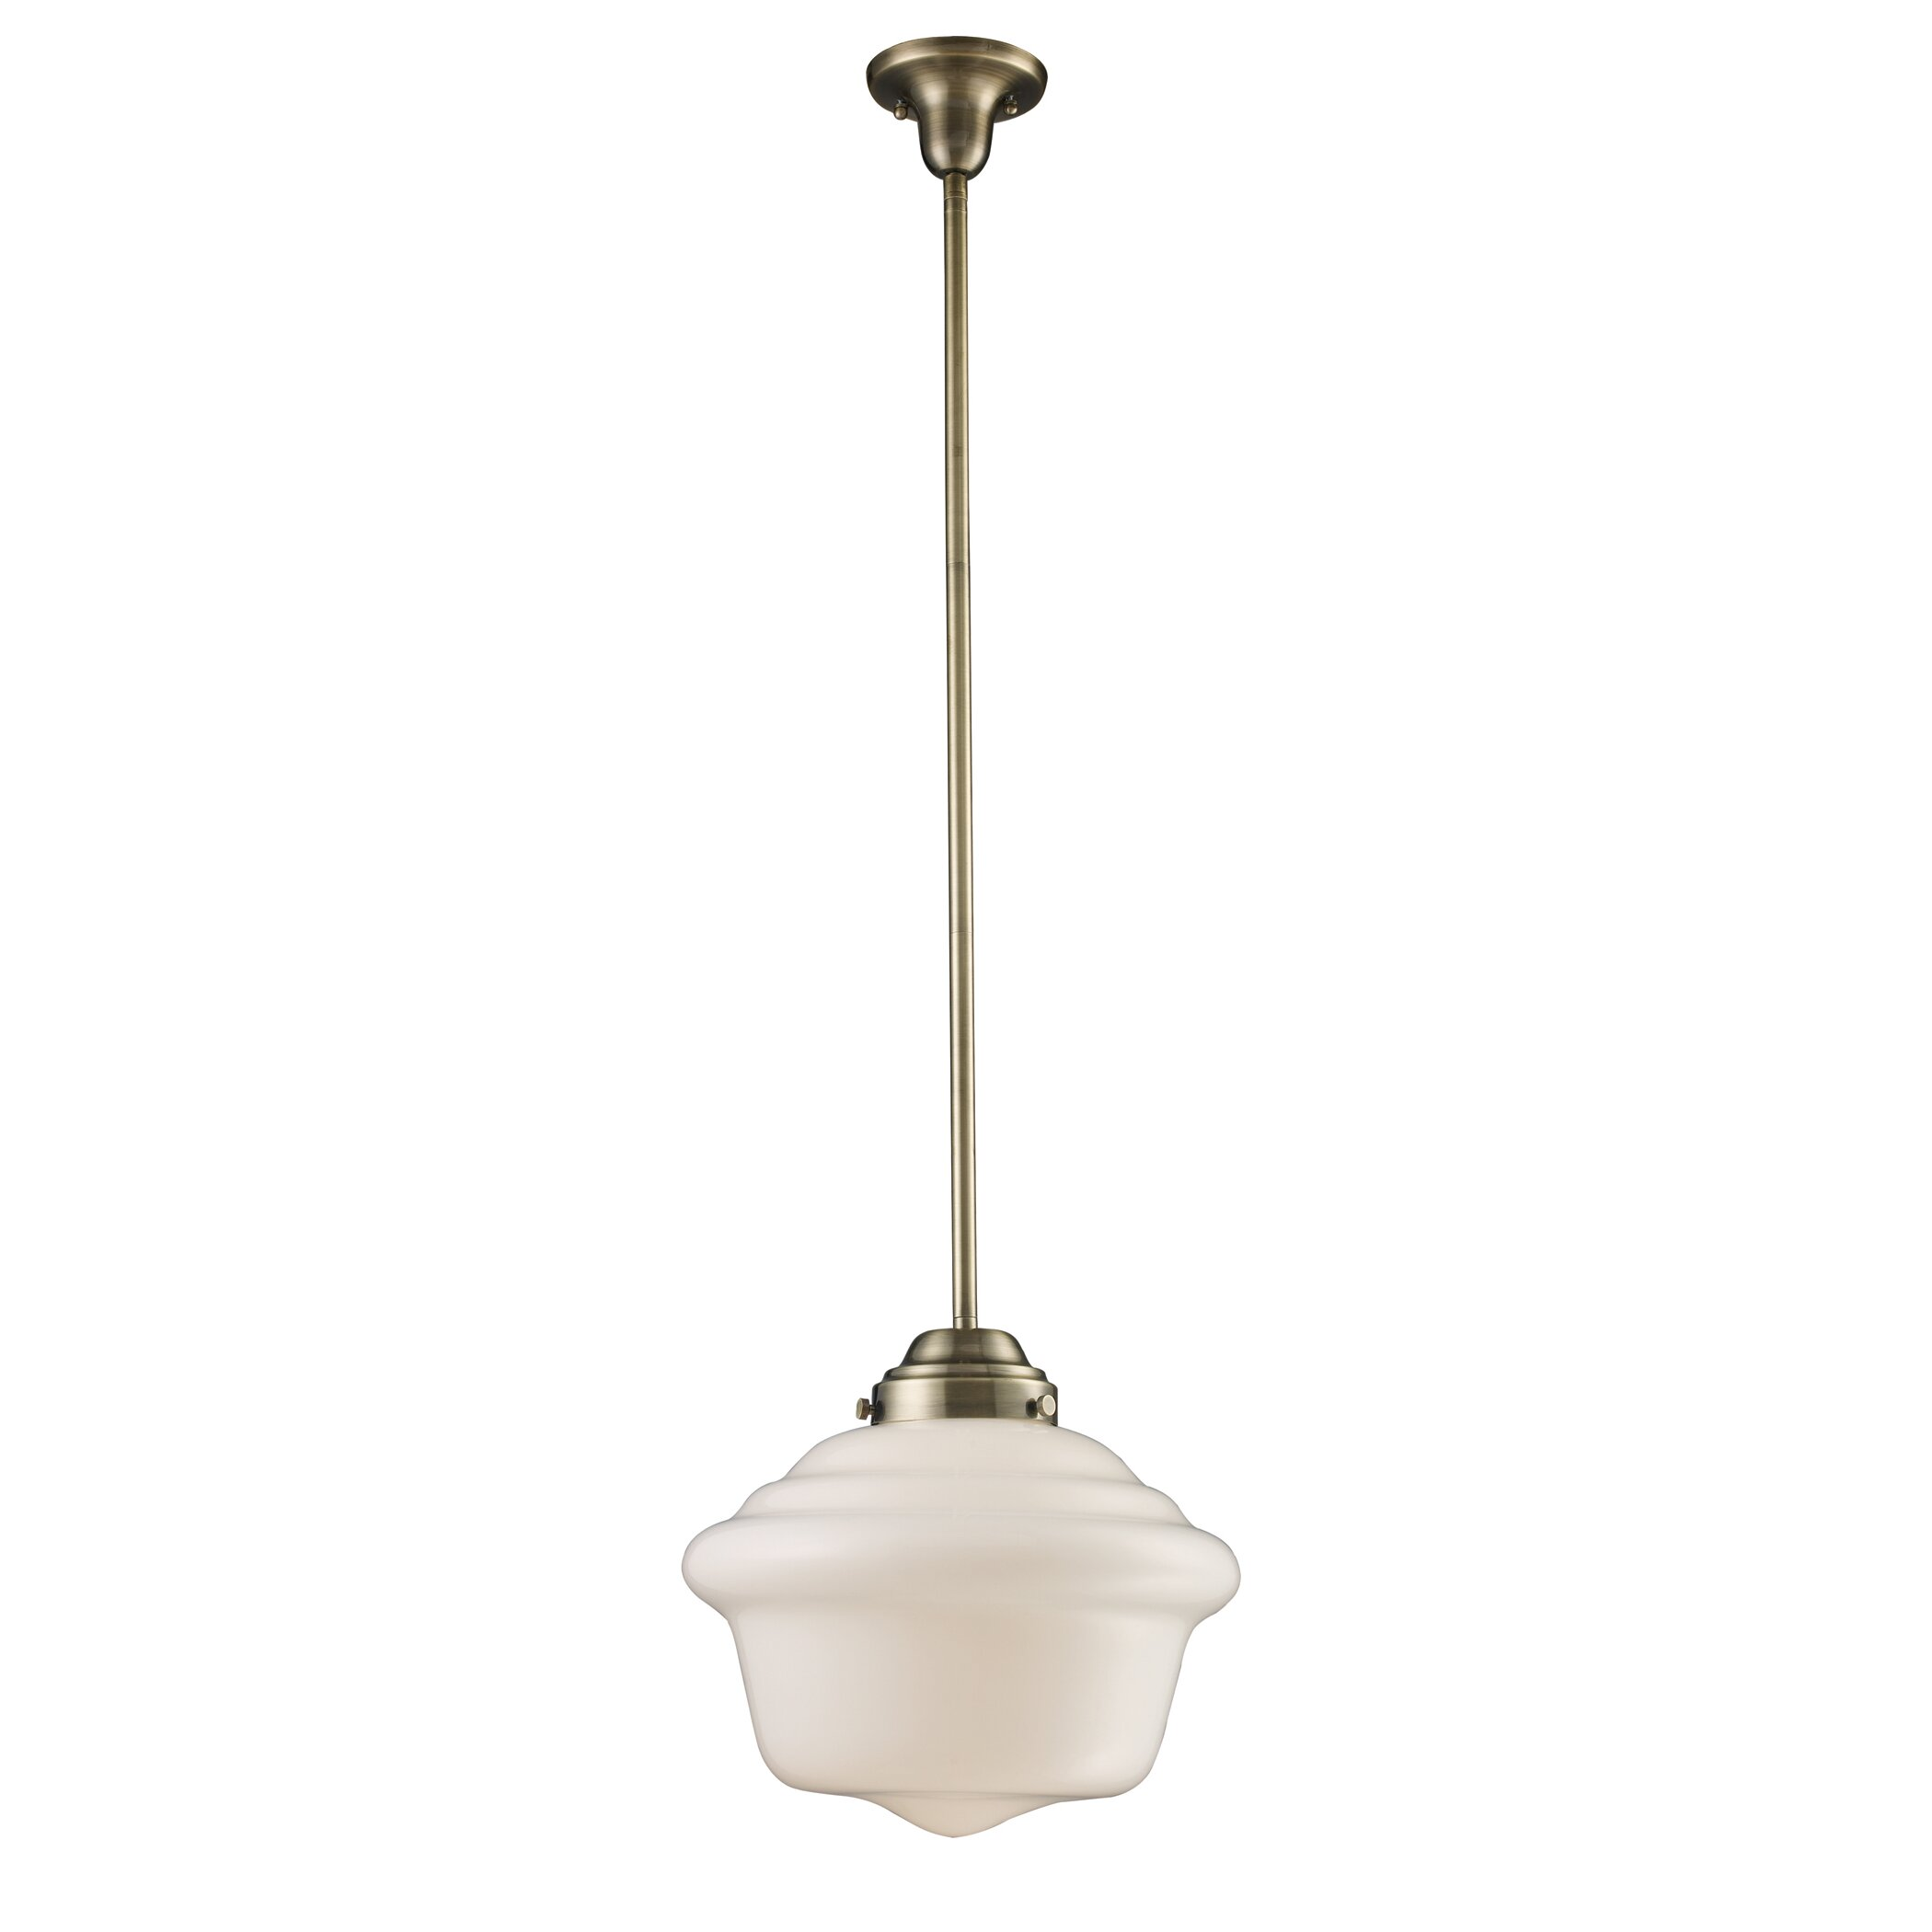 Elk Lighting Schoolhouse Pendant: Landmark Lighting 1 Light Schoolhouse Pendant & Reviews